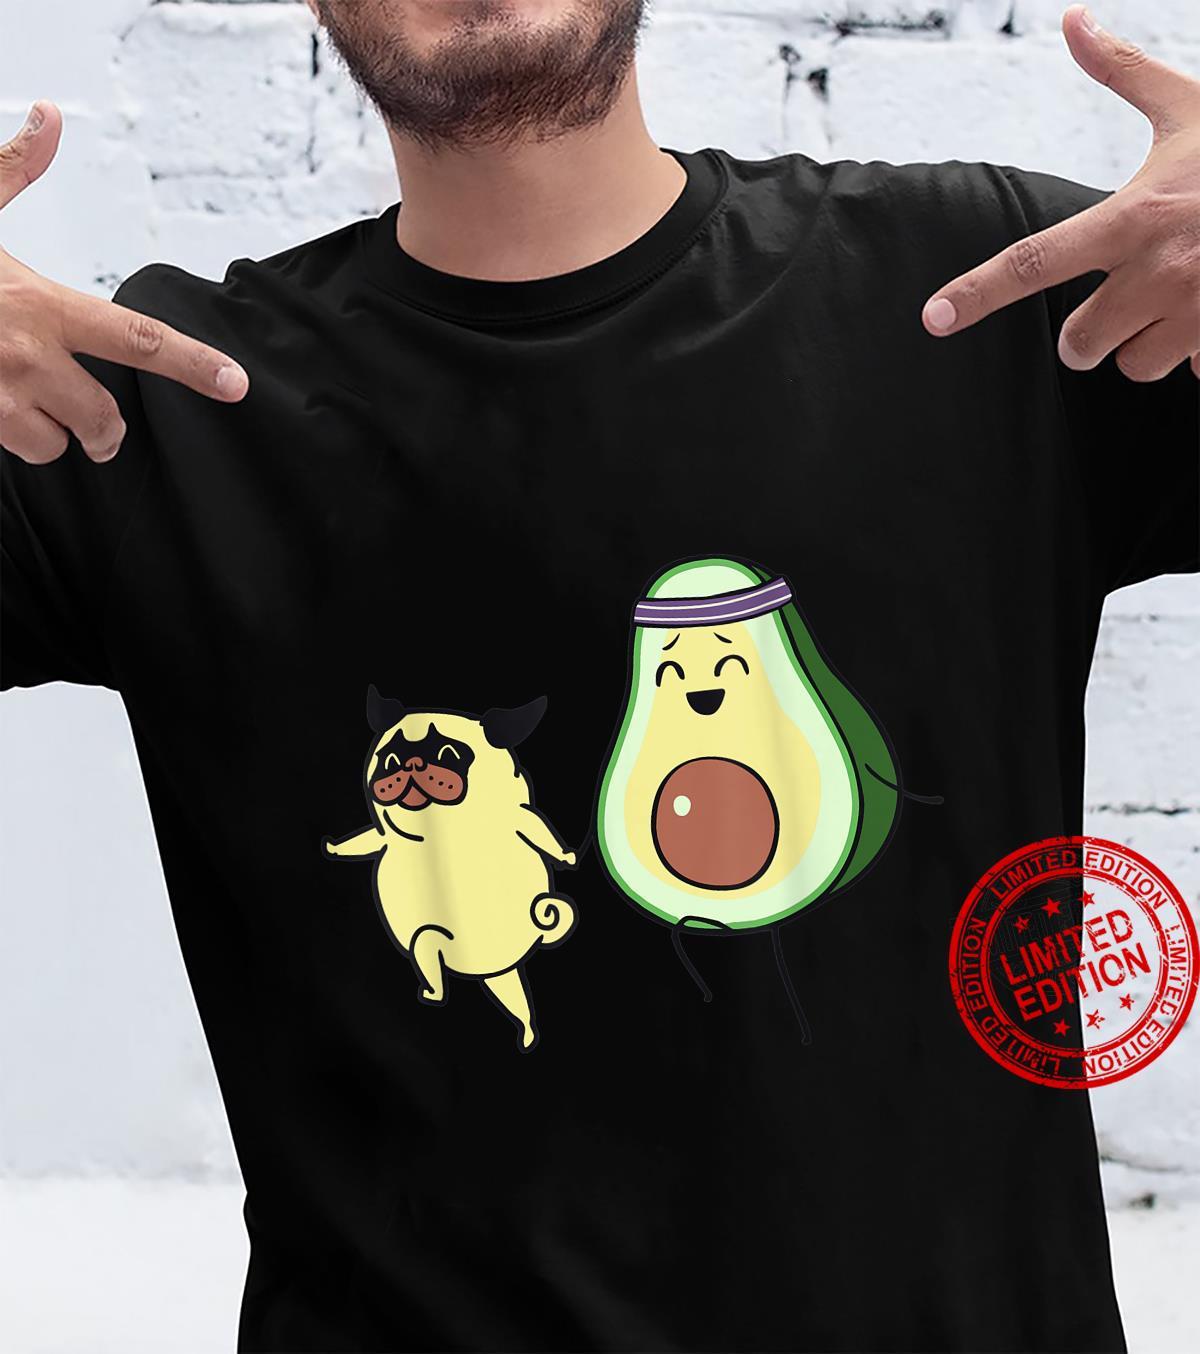 Good Kind of Fat Shirt